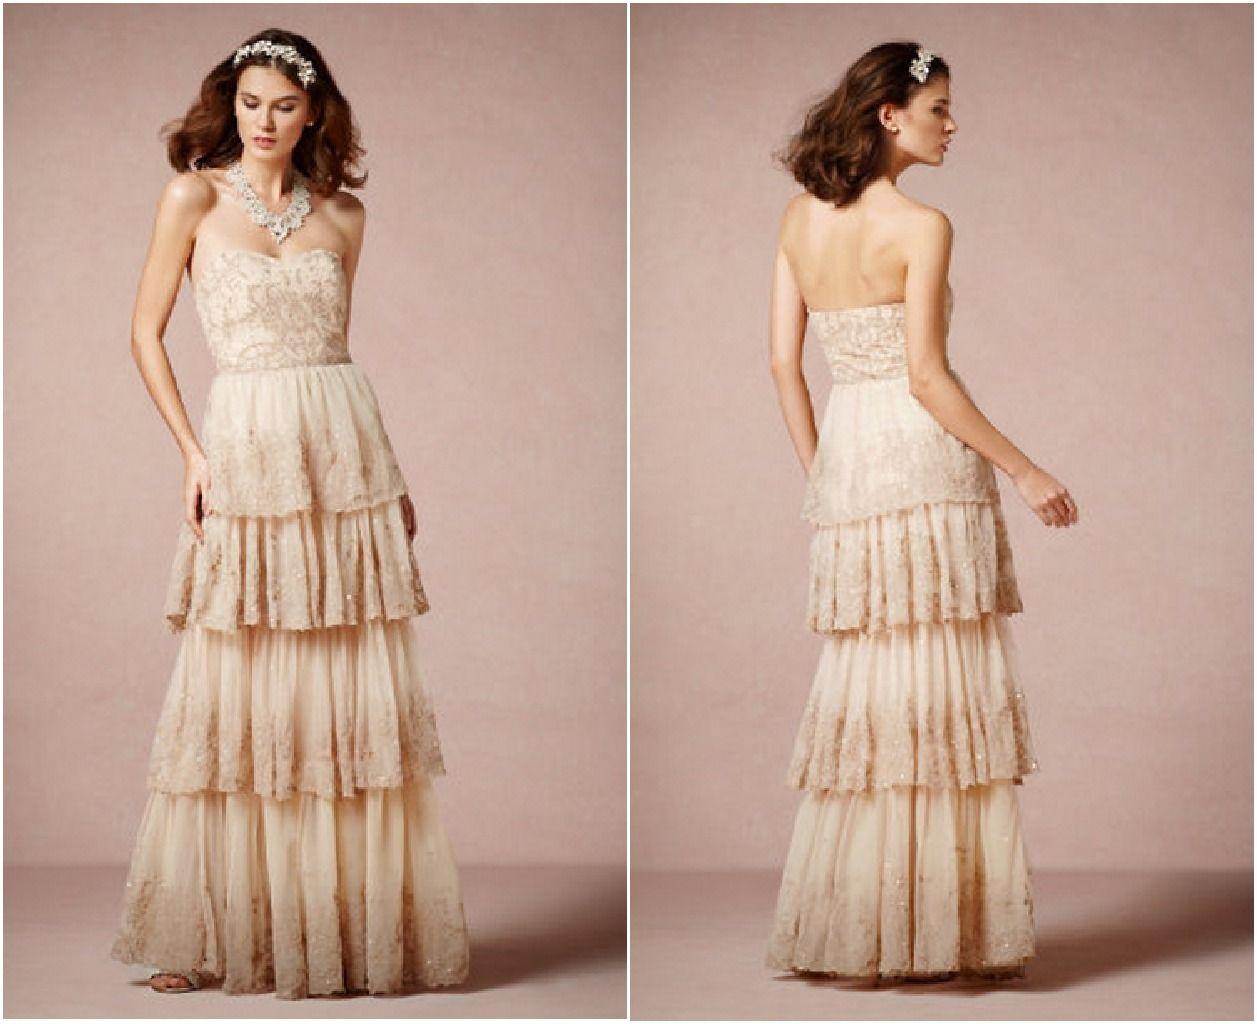 Romantic Wedding Dresses Evening Dresses For Weddings Designer Bridesmaid Dresses Wedding Dresses